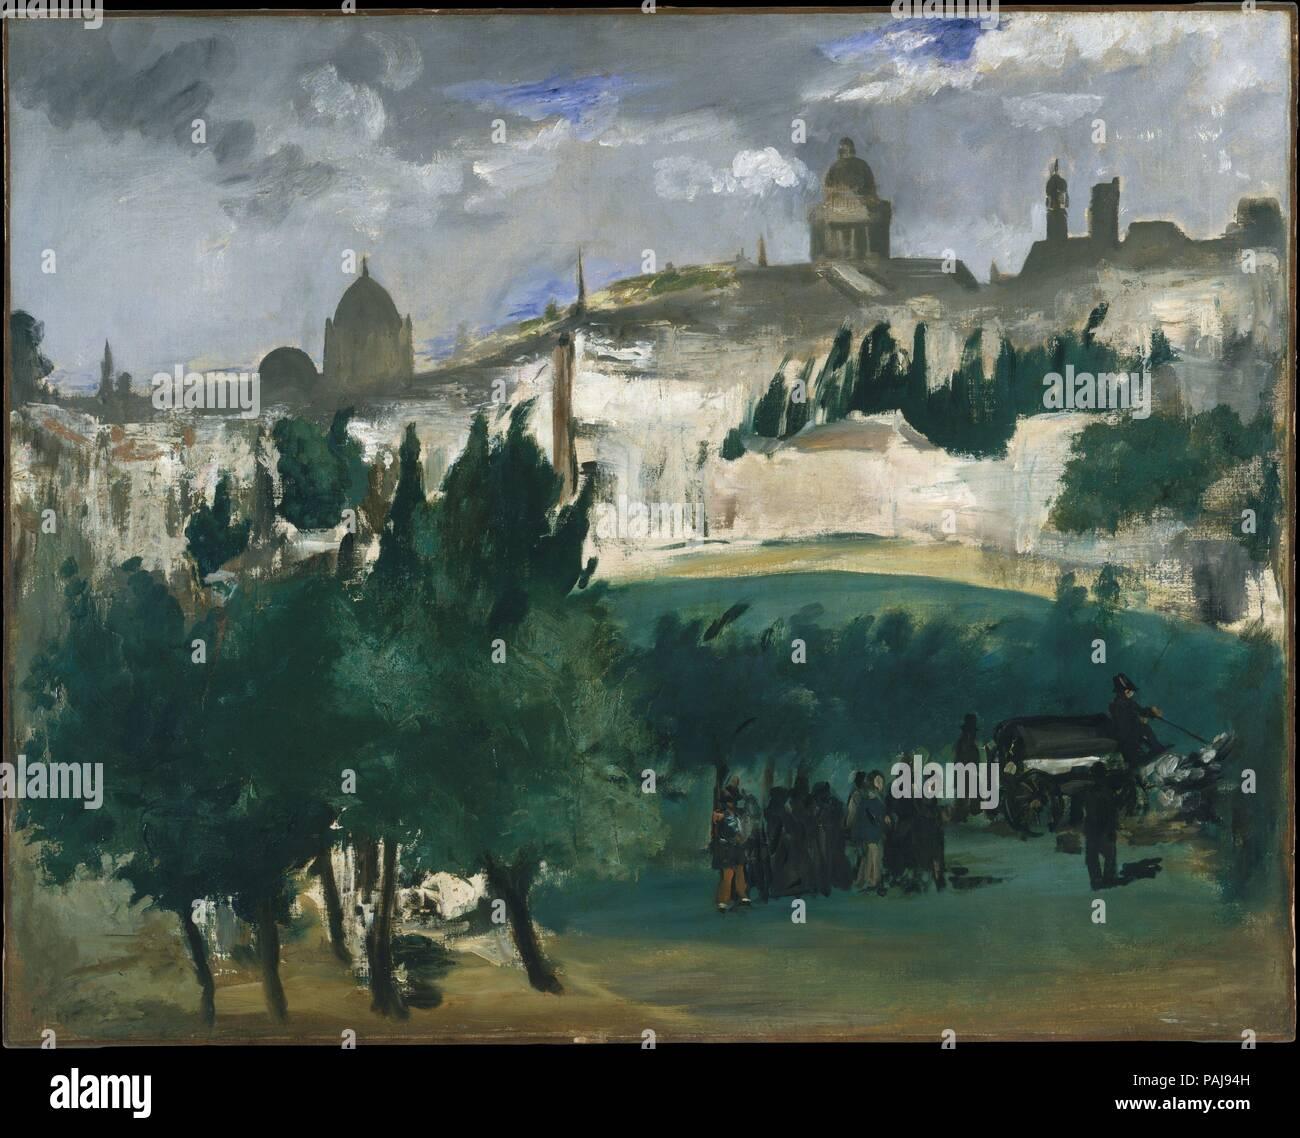 El funeral. Artista: Édouard Manet (francés, París París 1832-1883 ...